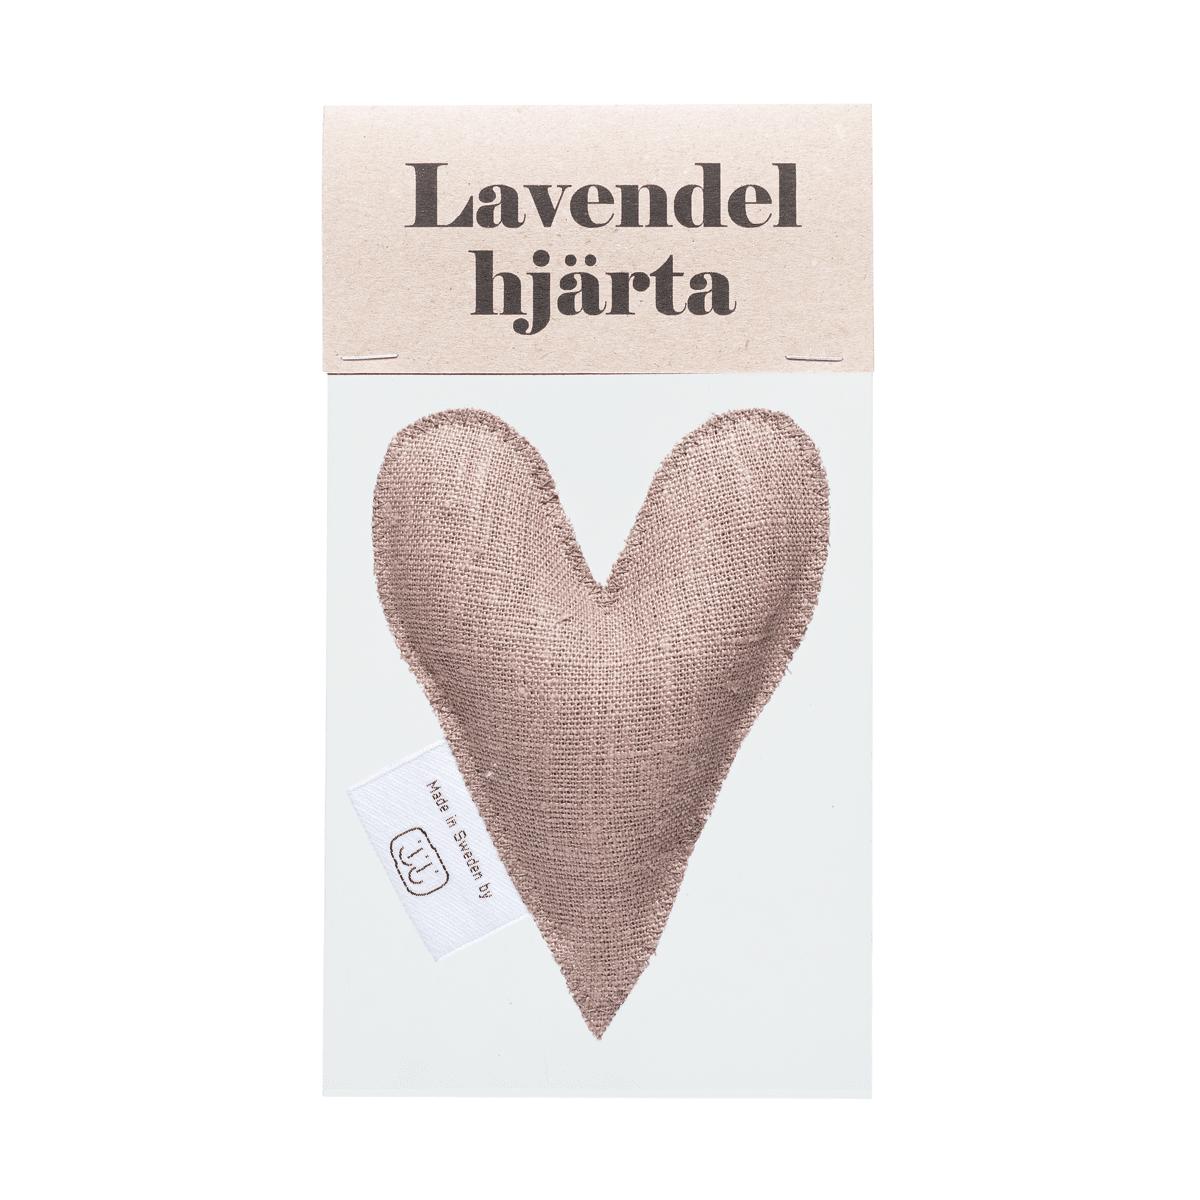 Nougat lavendelhjärta i påse